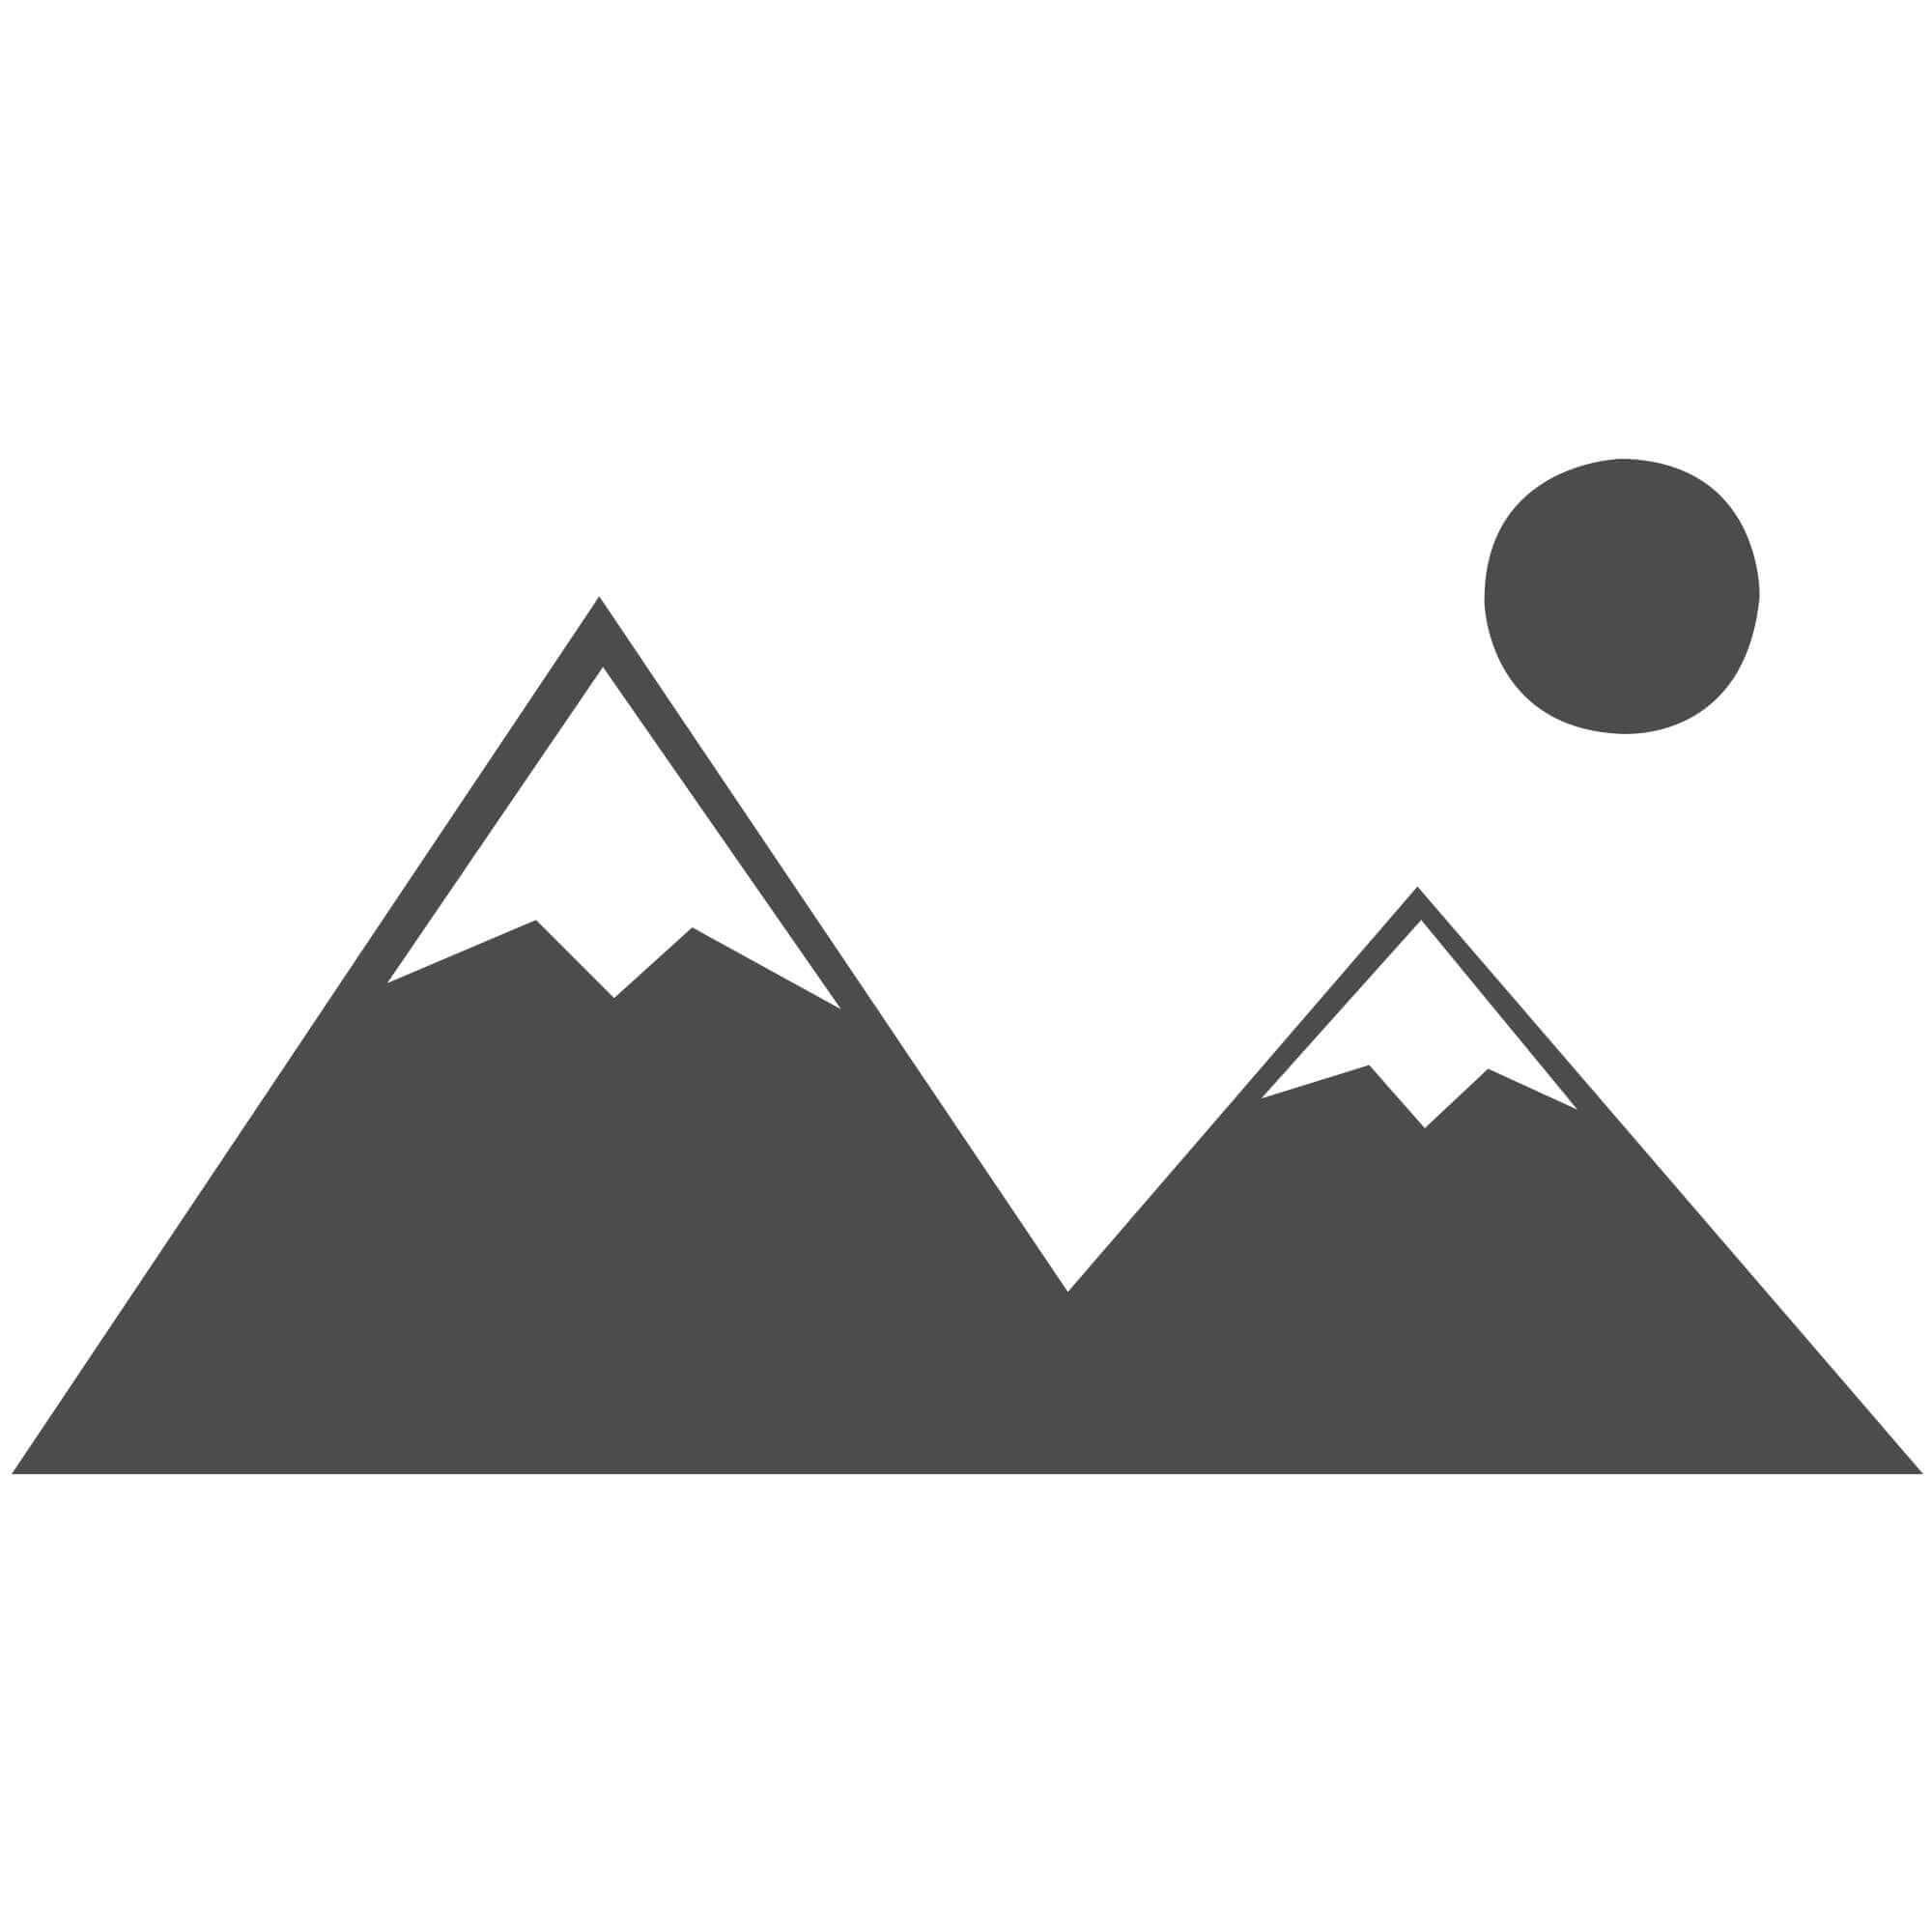 Winchester Petite Console Table